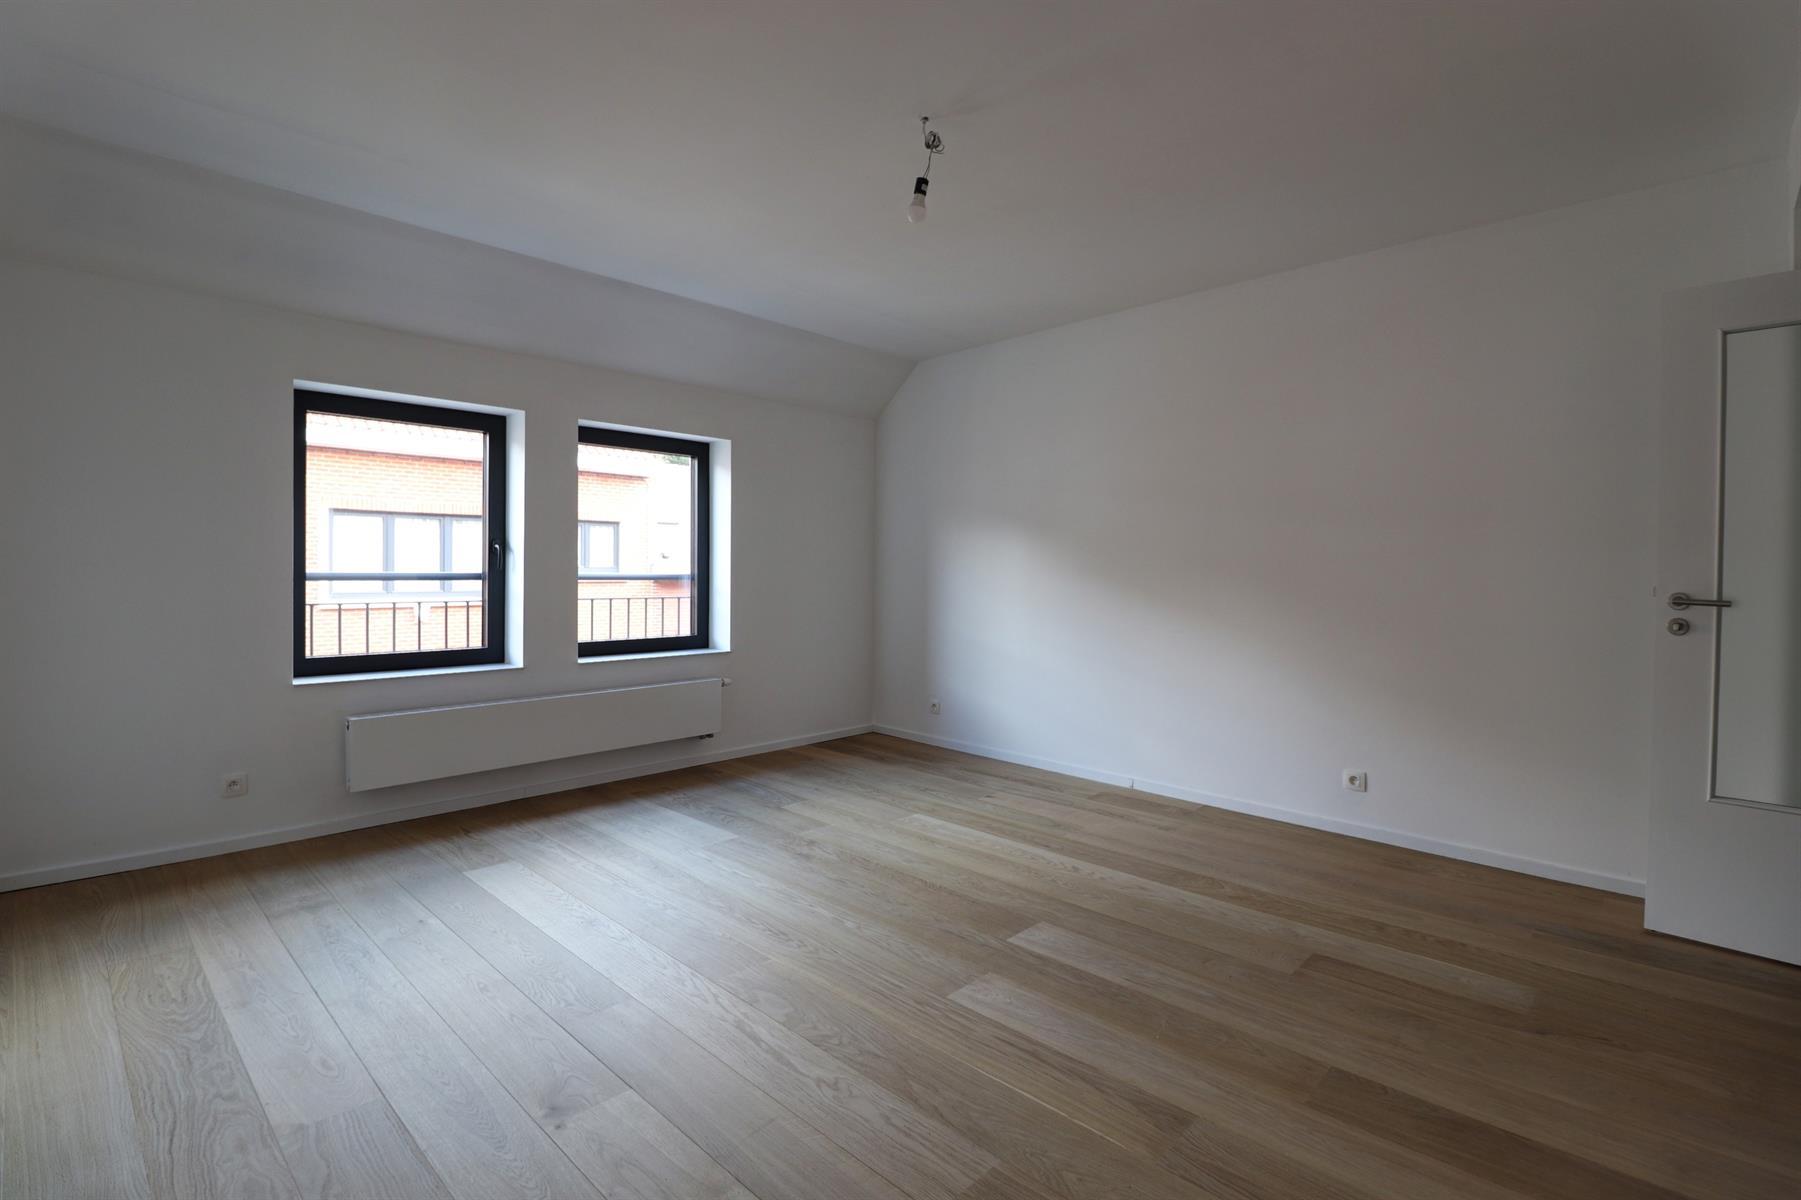 Duplex - Auderghem - #4185468-5